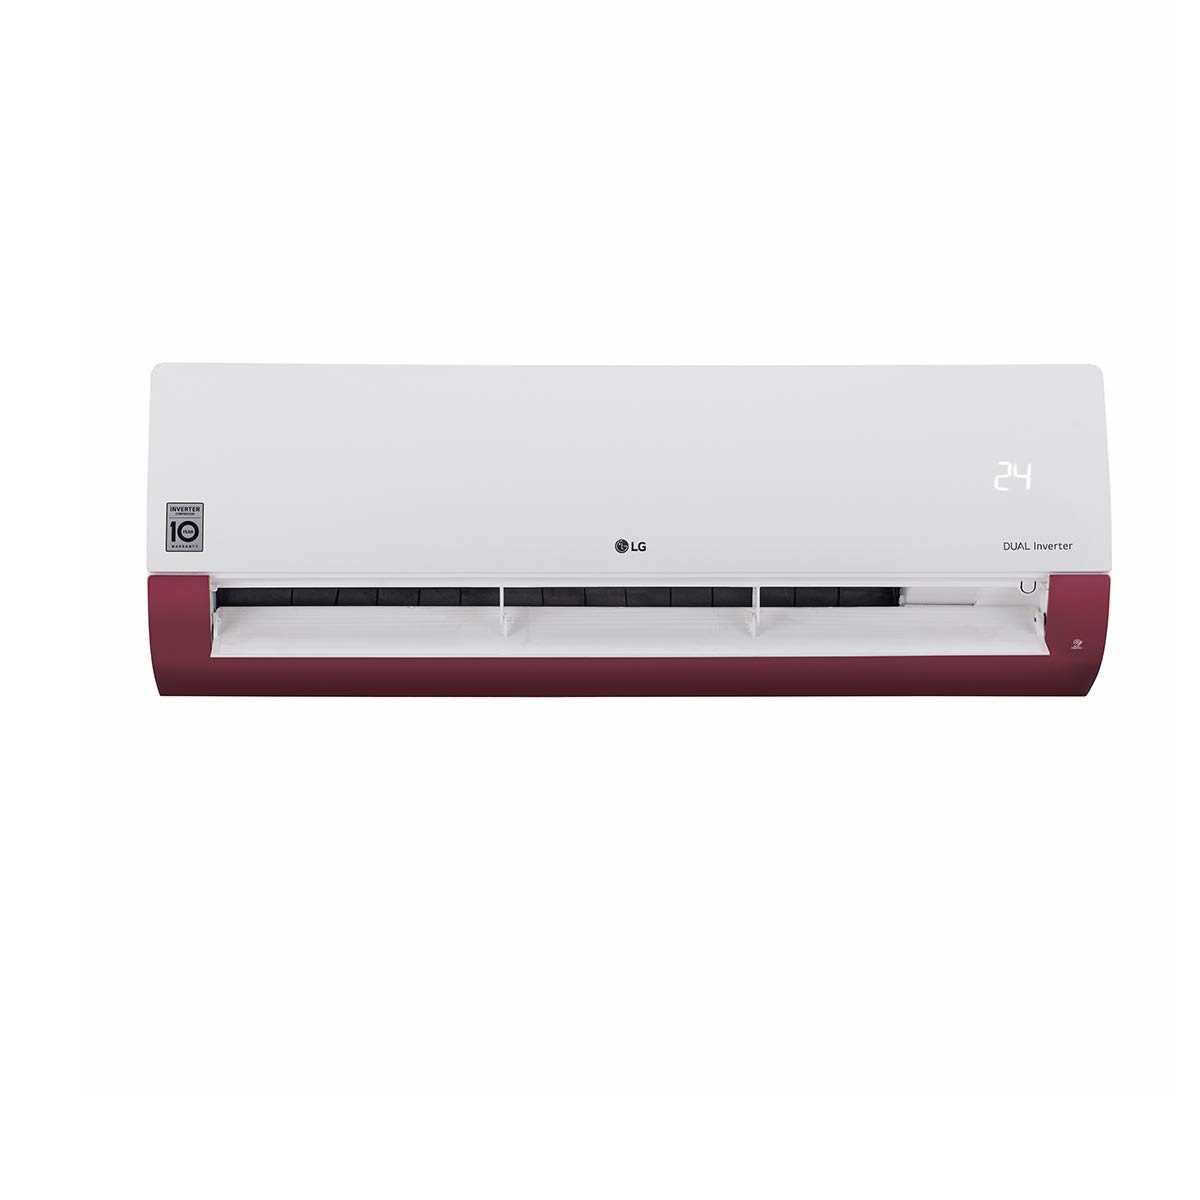 LG KS Q18WNXD 1.5 Ton 3 Star Inverter Split AC